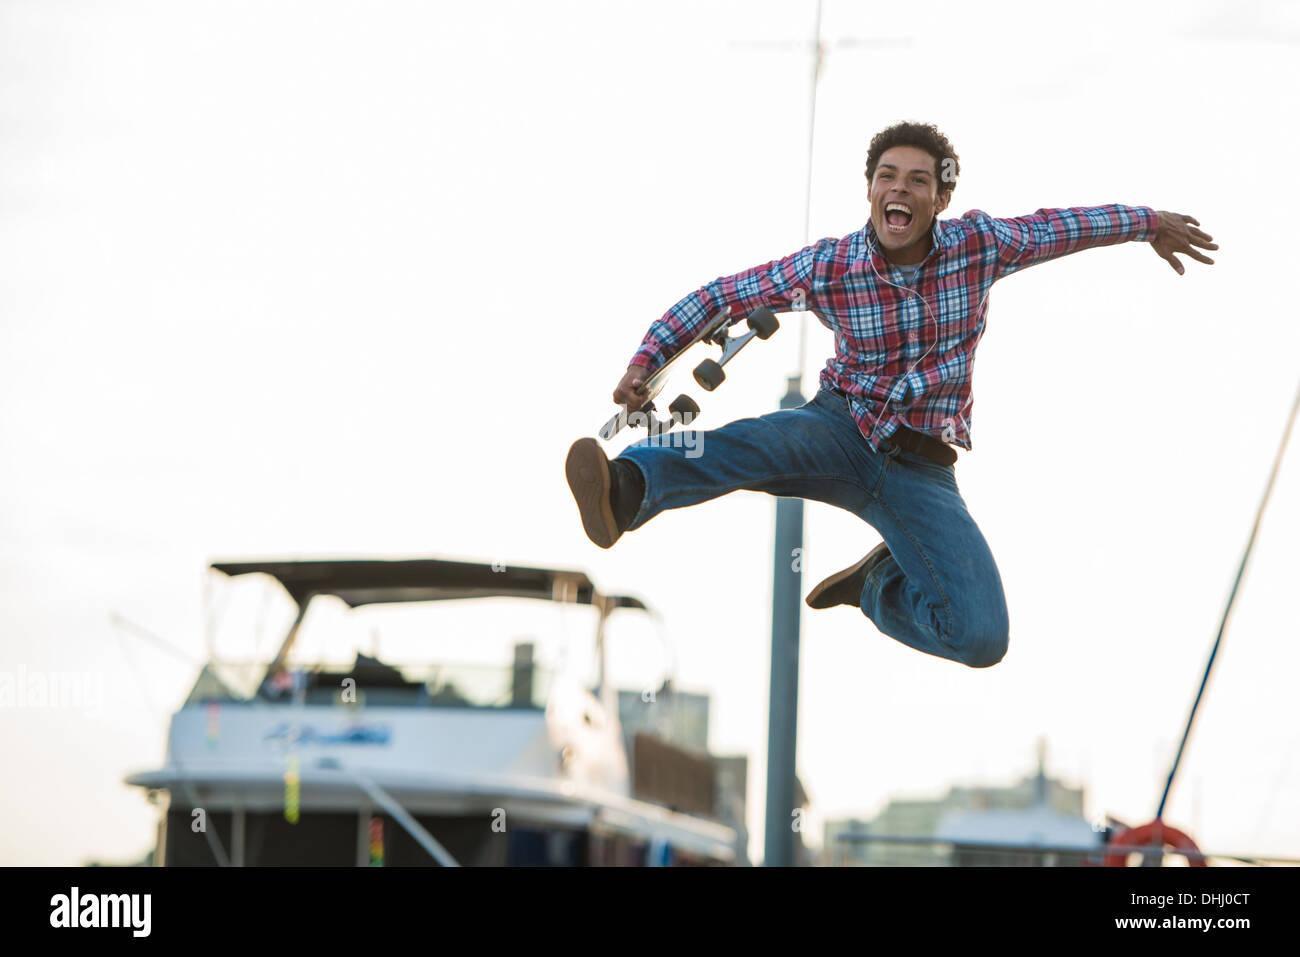 Skater saltando de alegría Imagen De Stock